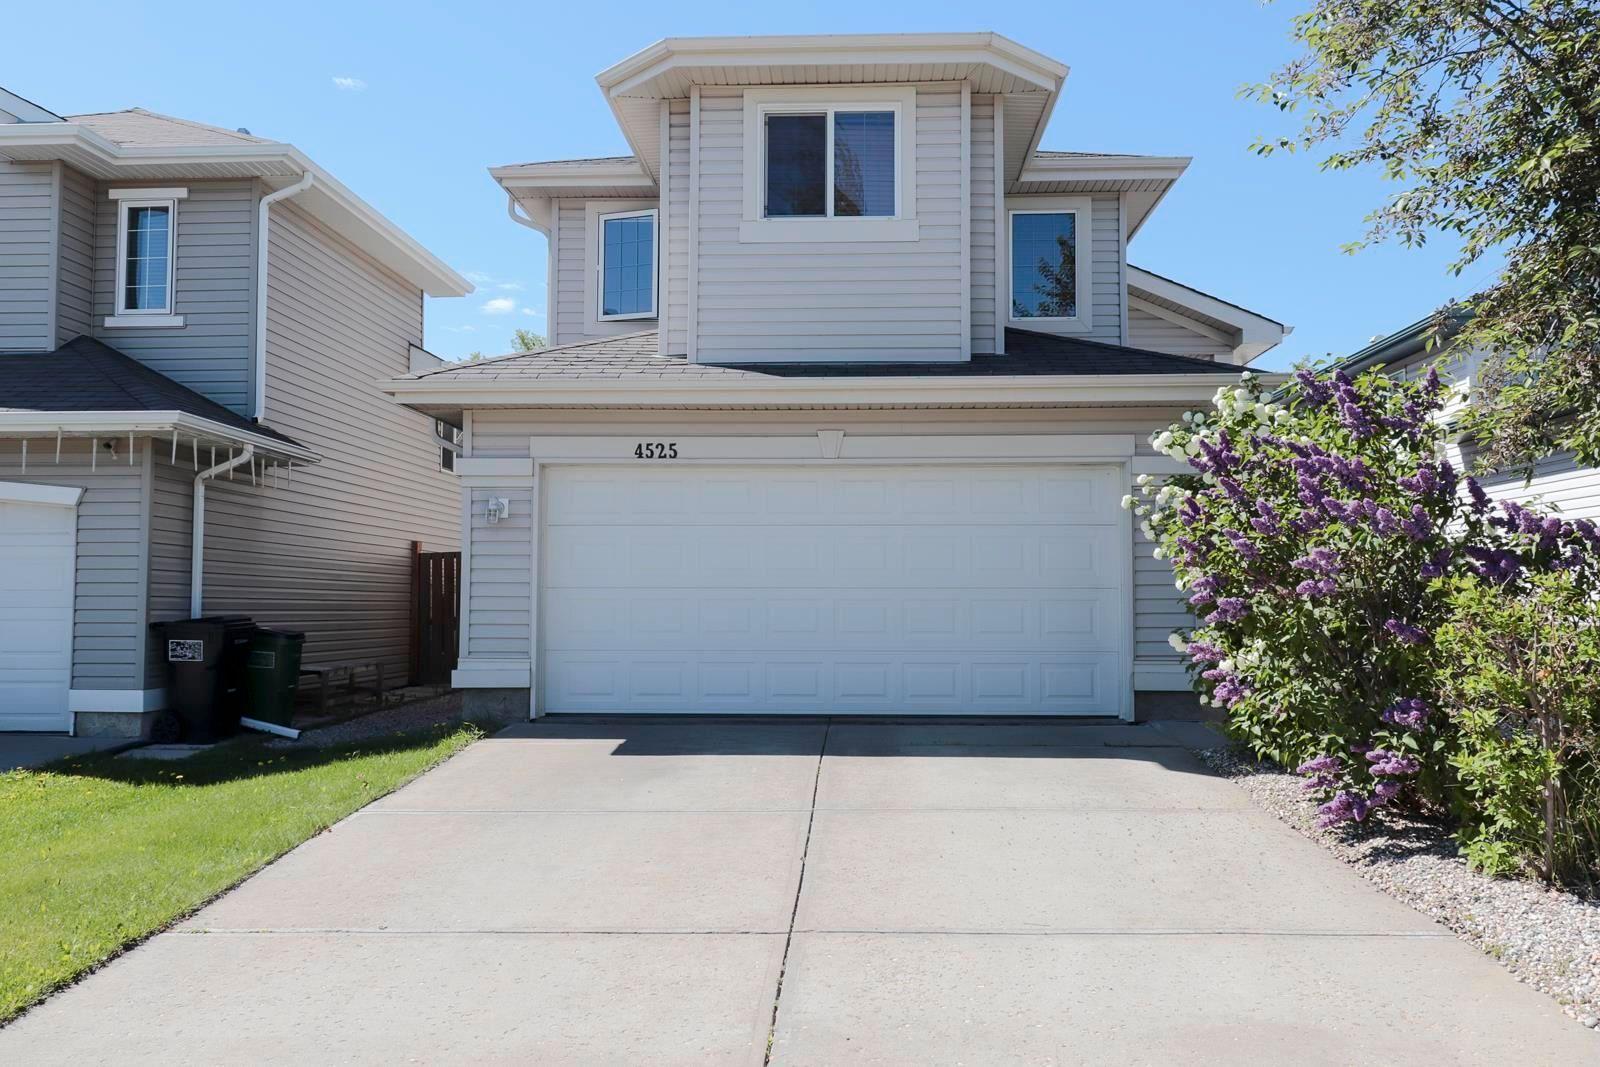 Main Photo: 4525 154 Avenue in Edmonton: Zone 03 House for sale : MLS®# E4249203